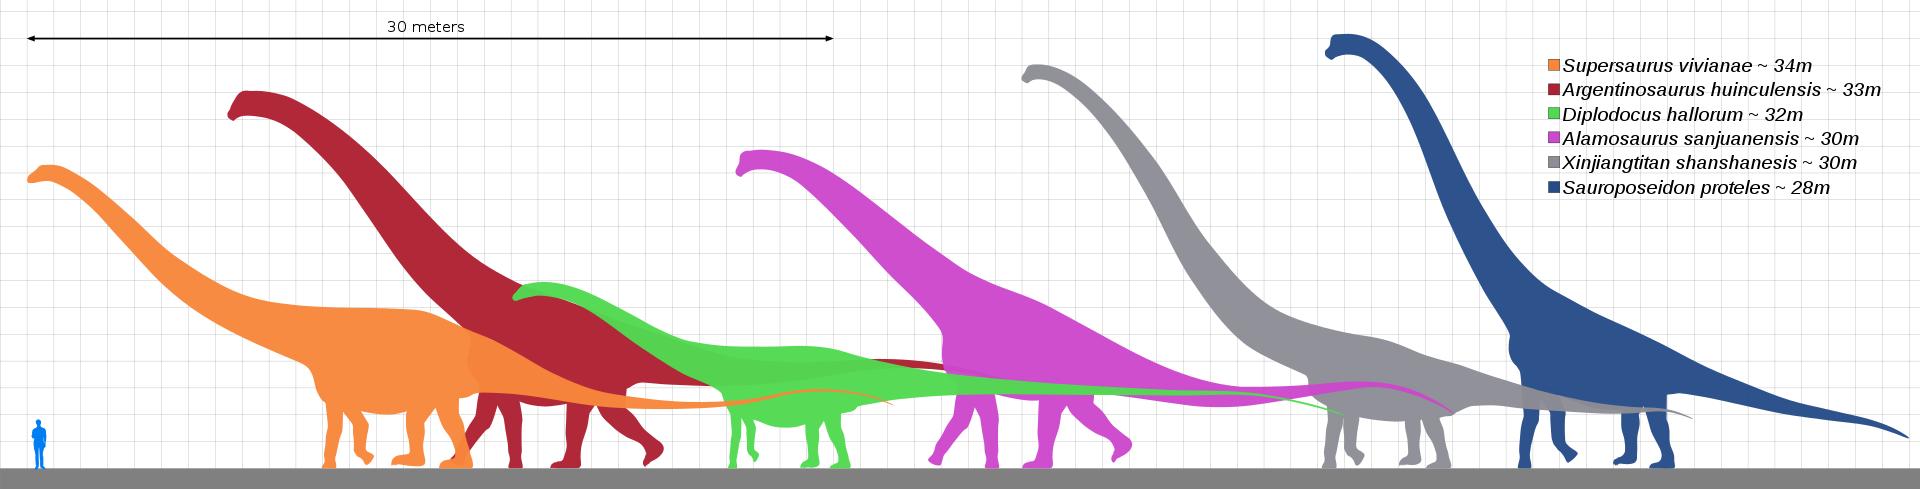 1920px-Longest_dinosaurs2.svg